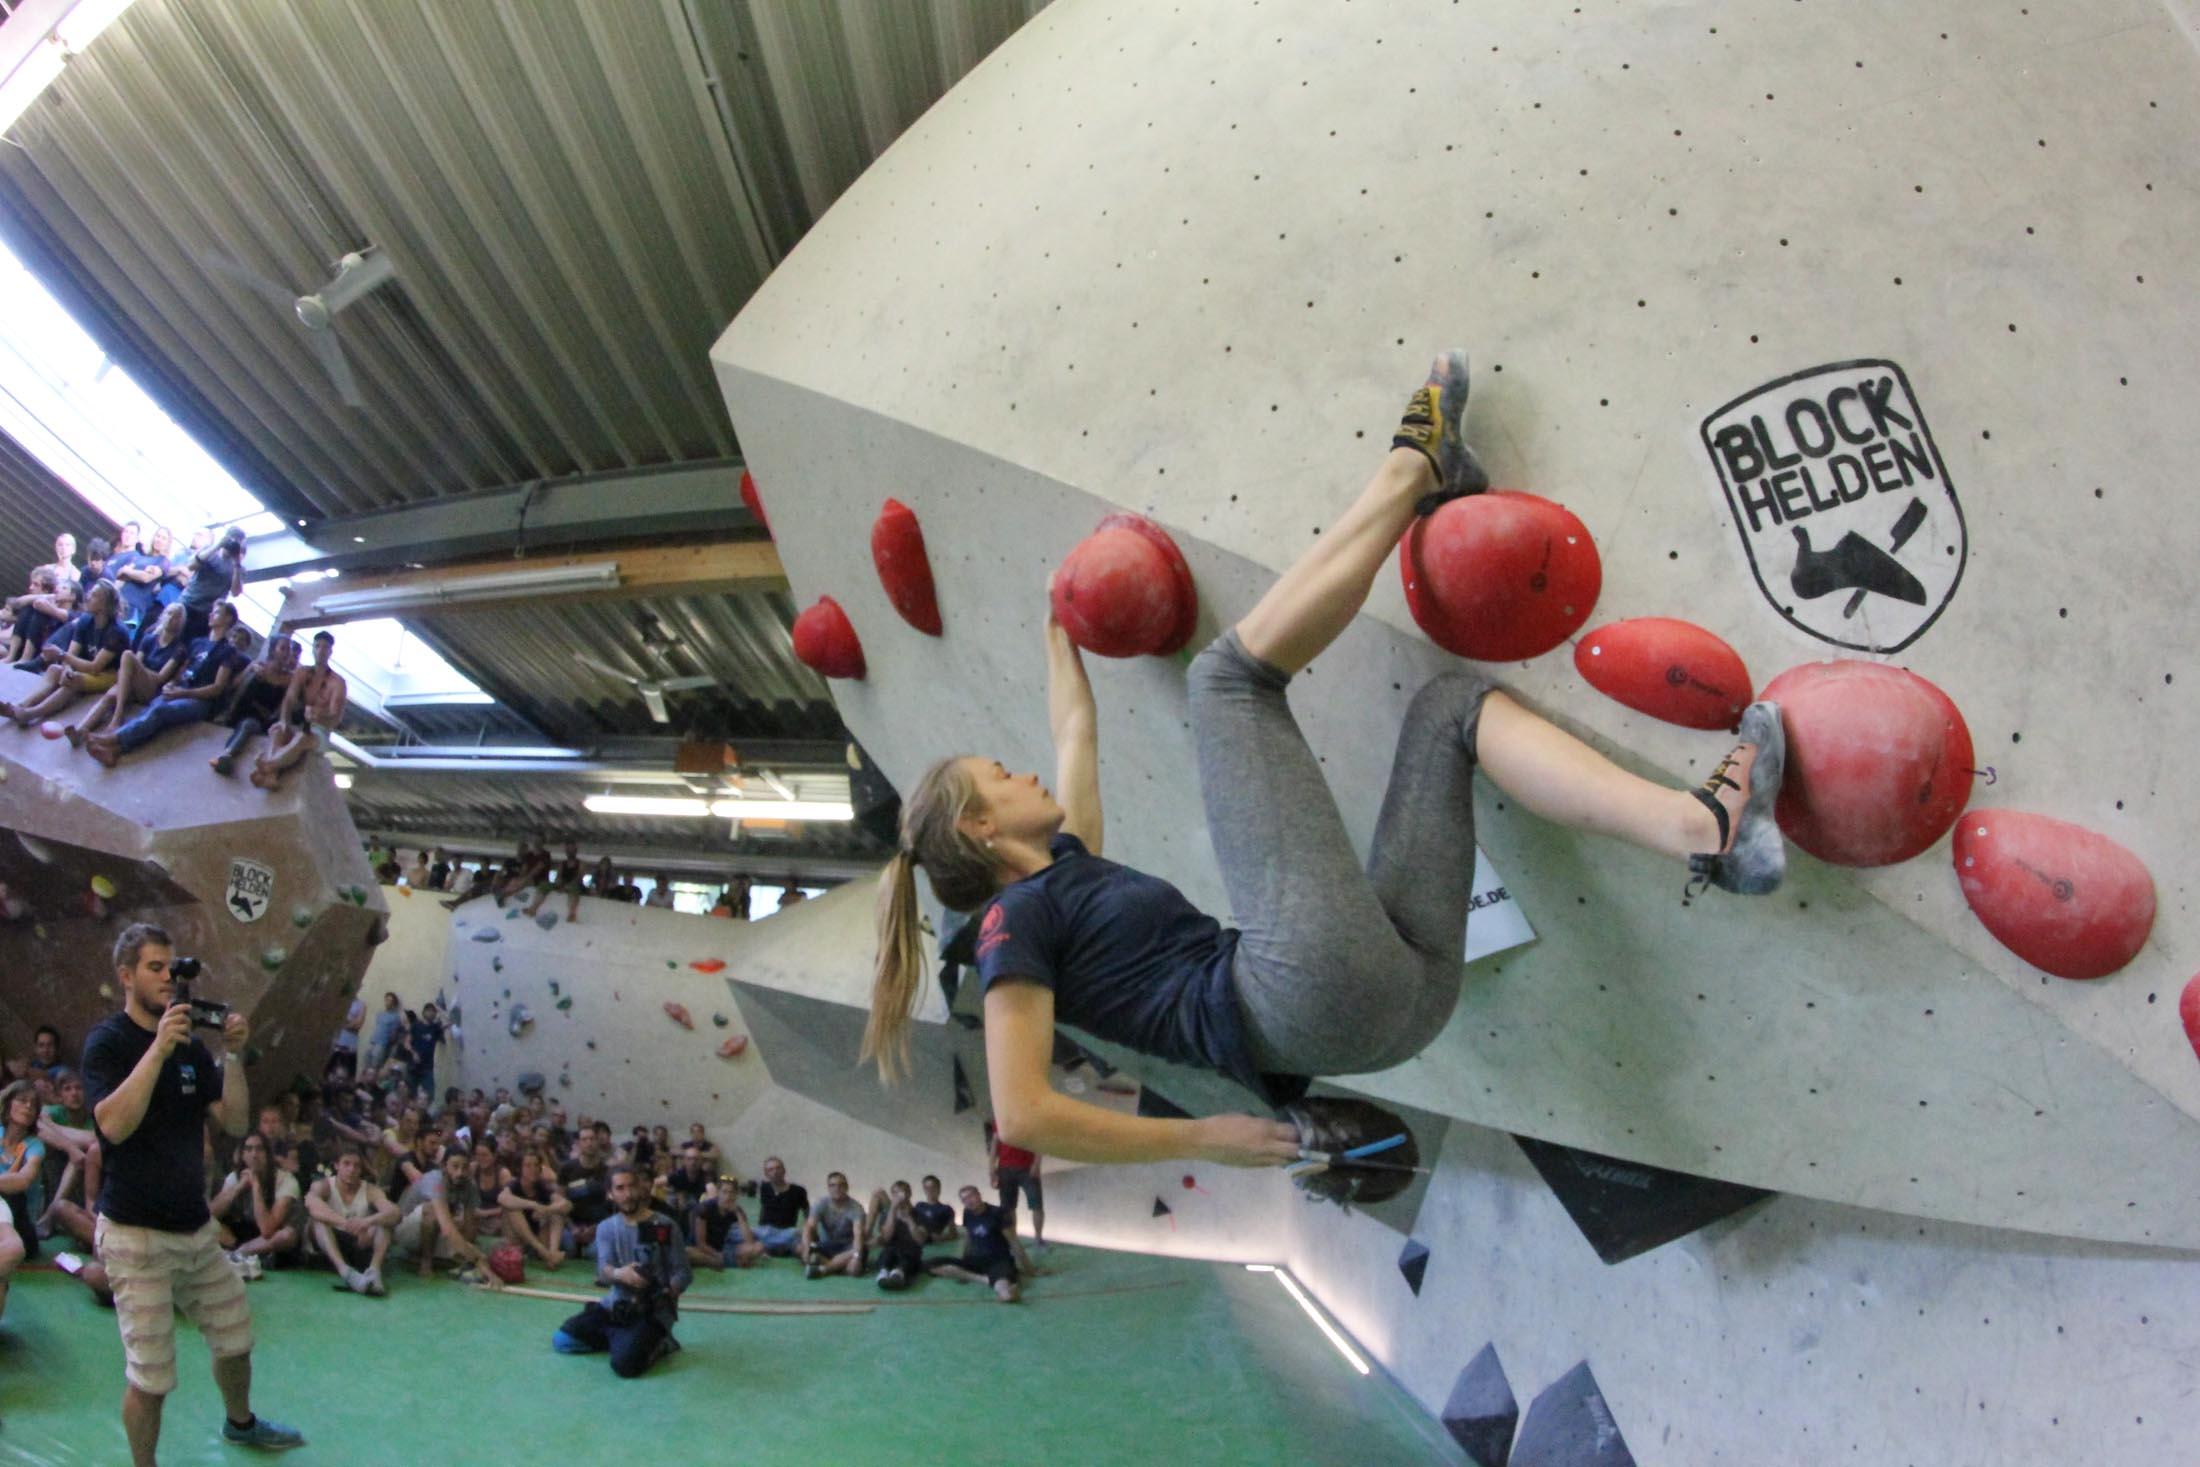 Finale, internationaler bouldercup Frankenjura 2016, BLOCKHELDEN Erlangen, Mammut, Bergfreunde.de, Boulderwettkampf07092016641